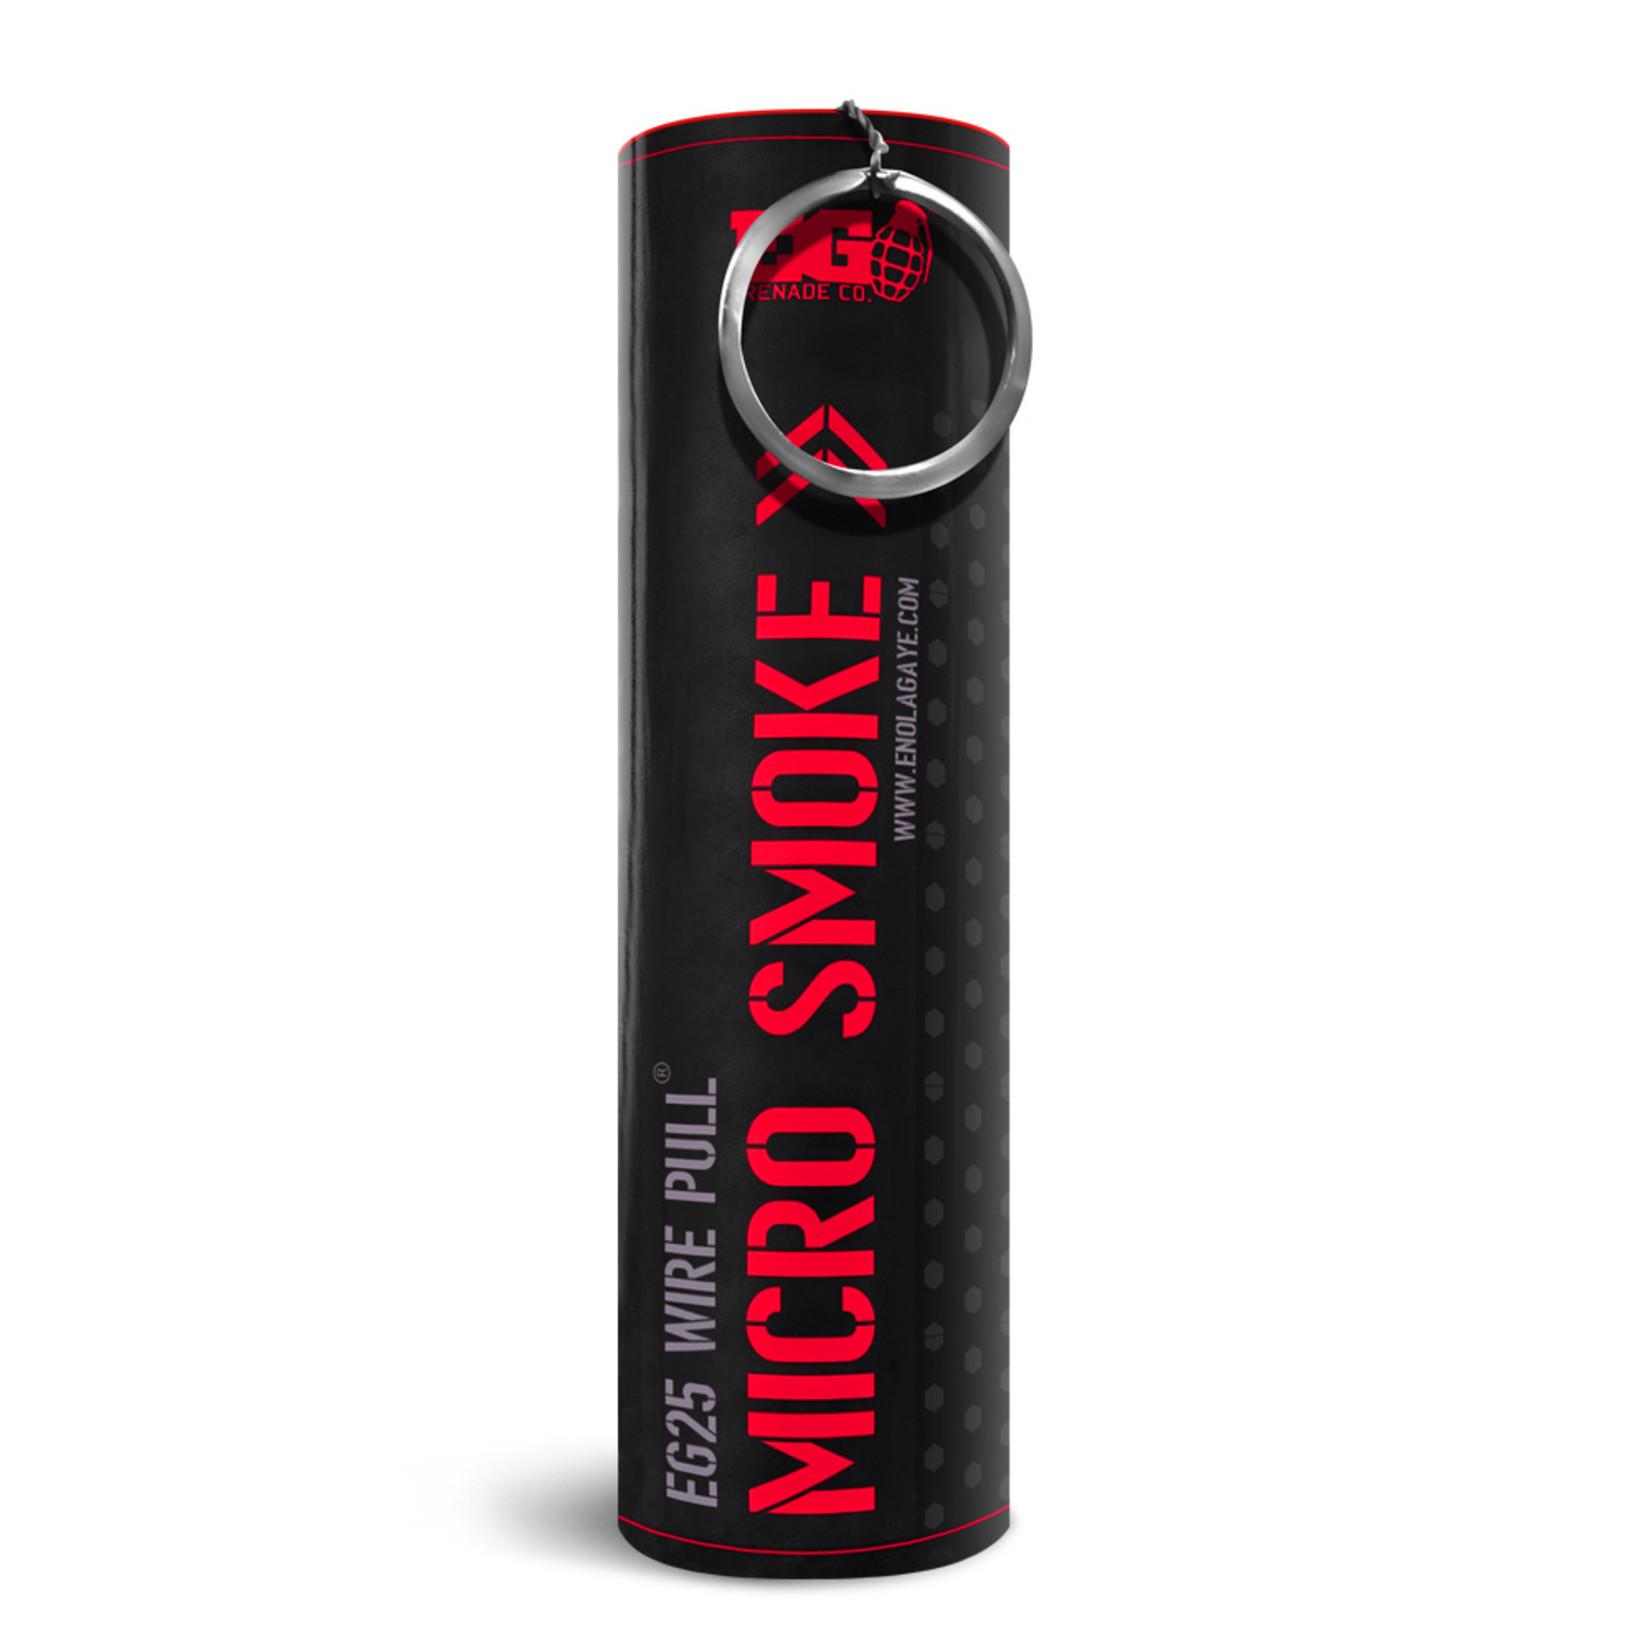 EG25 Micro Smoke Grenade Red